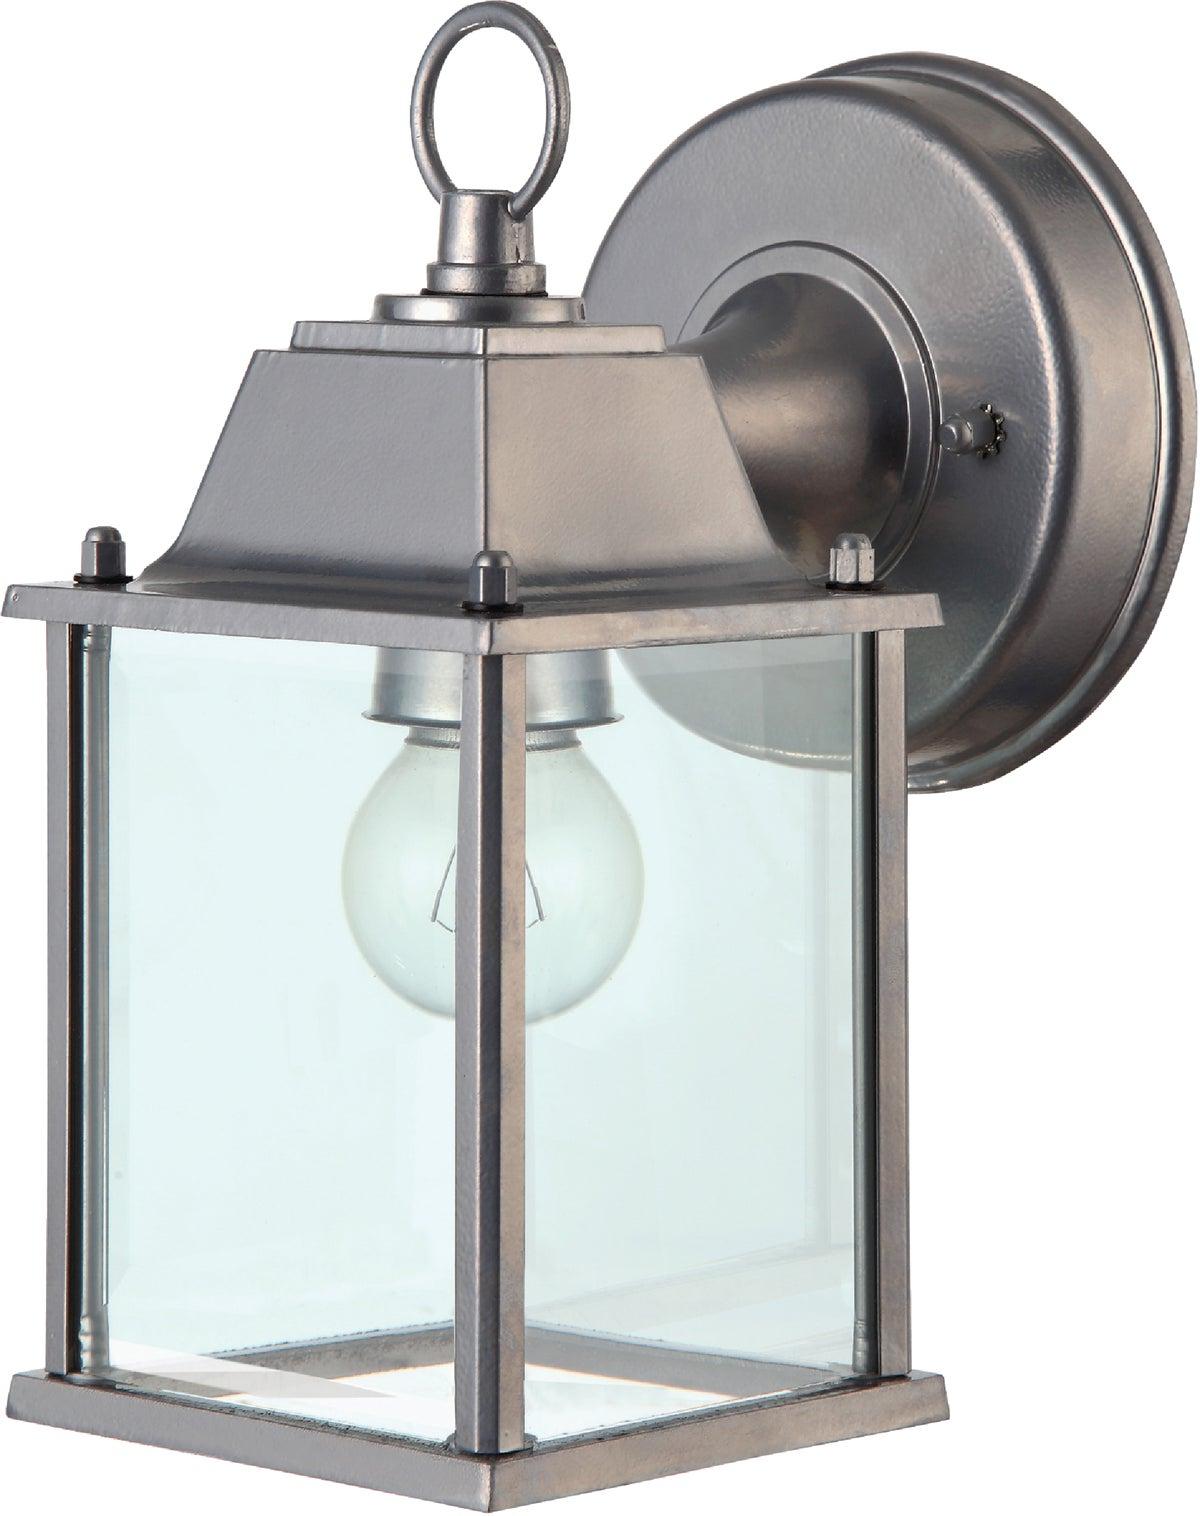 Krajewski 8'' H Wall Lanterns Regarding Recent Buy Home Impressions Incandescent Lantern Outdoor Wall (View 2 of 15)